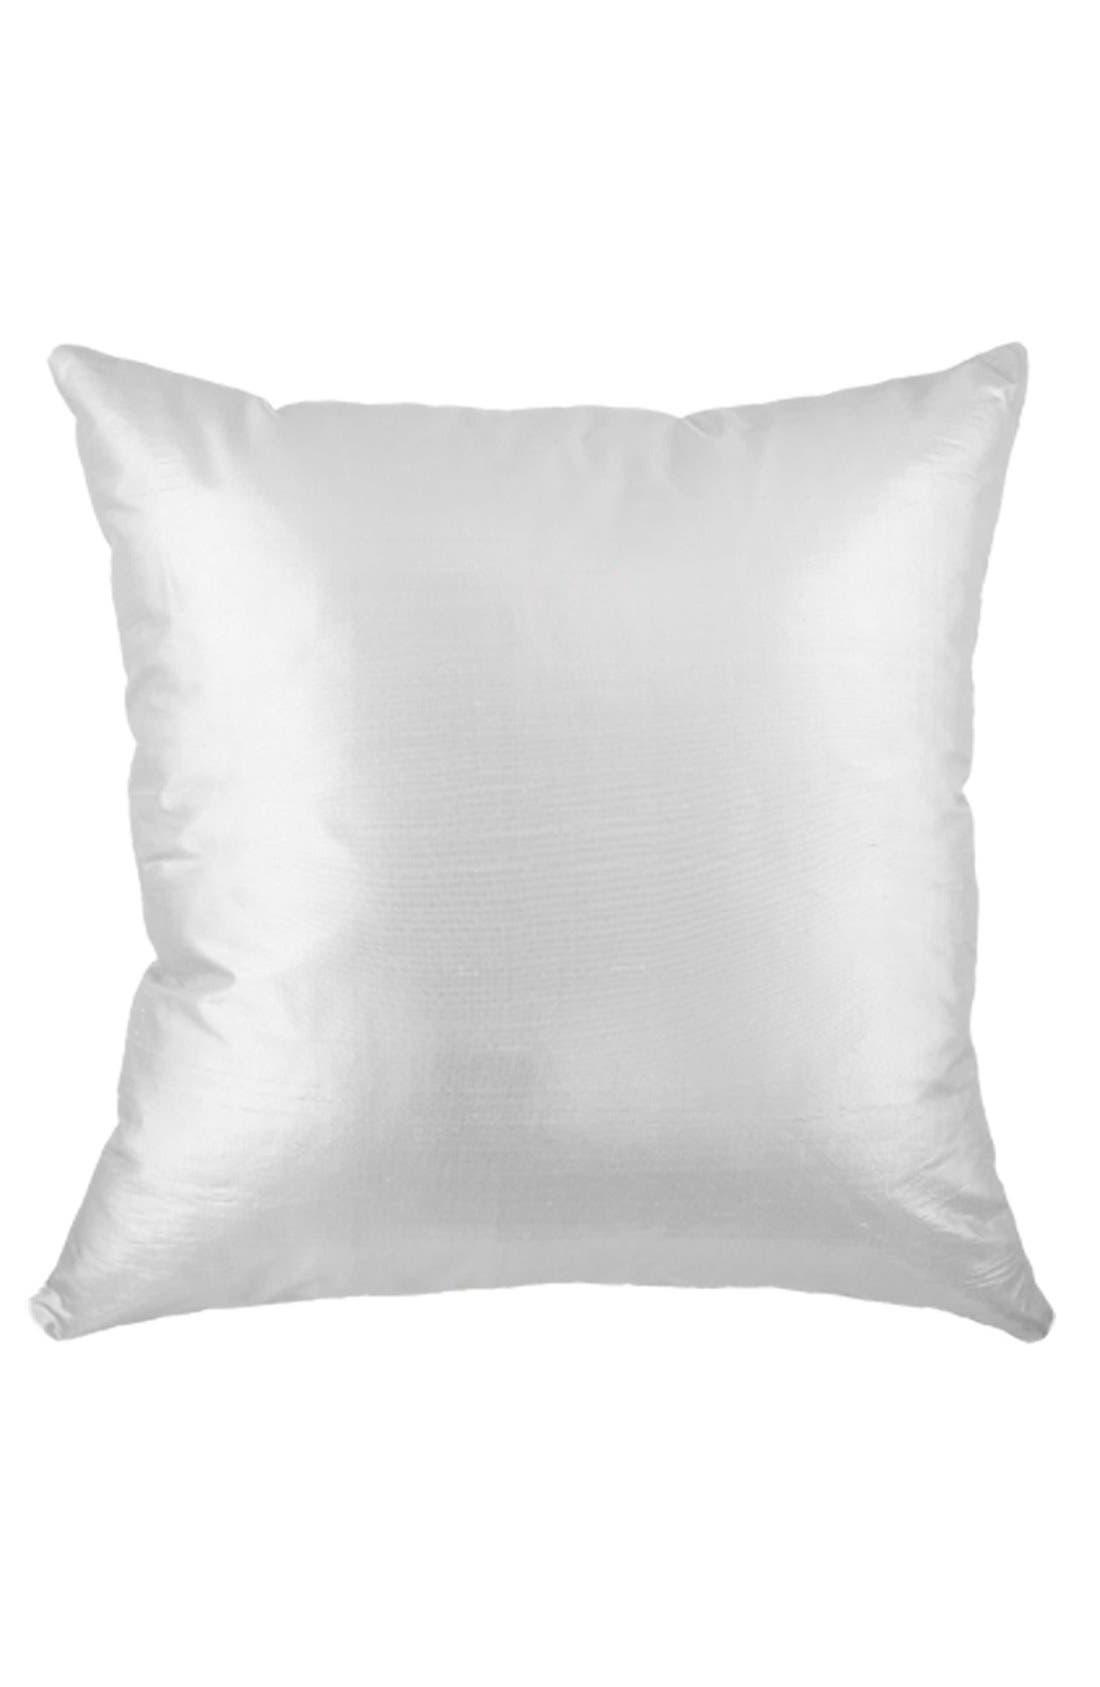 Main Image - KAS Designs 'Space' Pillow